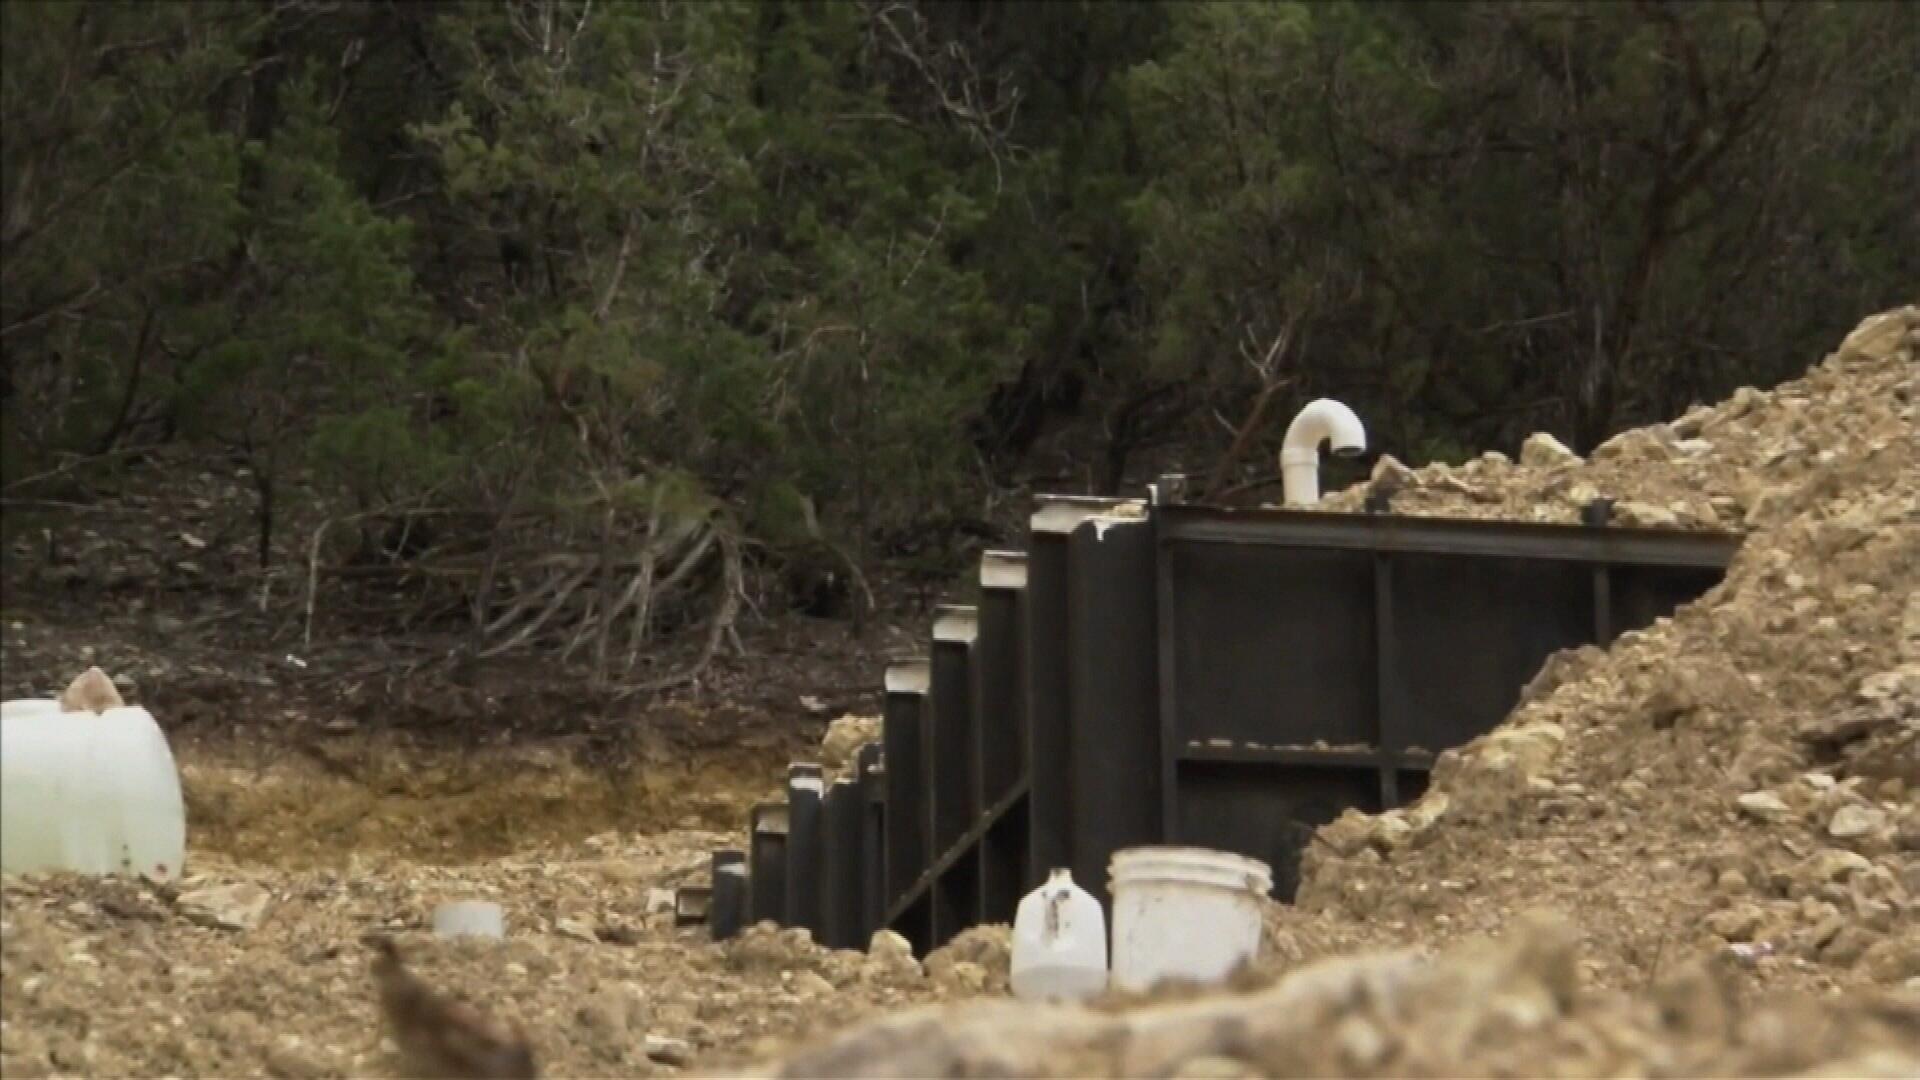 Coronavirus: Inside Queensland's underground COVID-19 bunkers